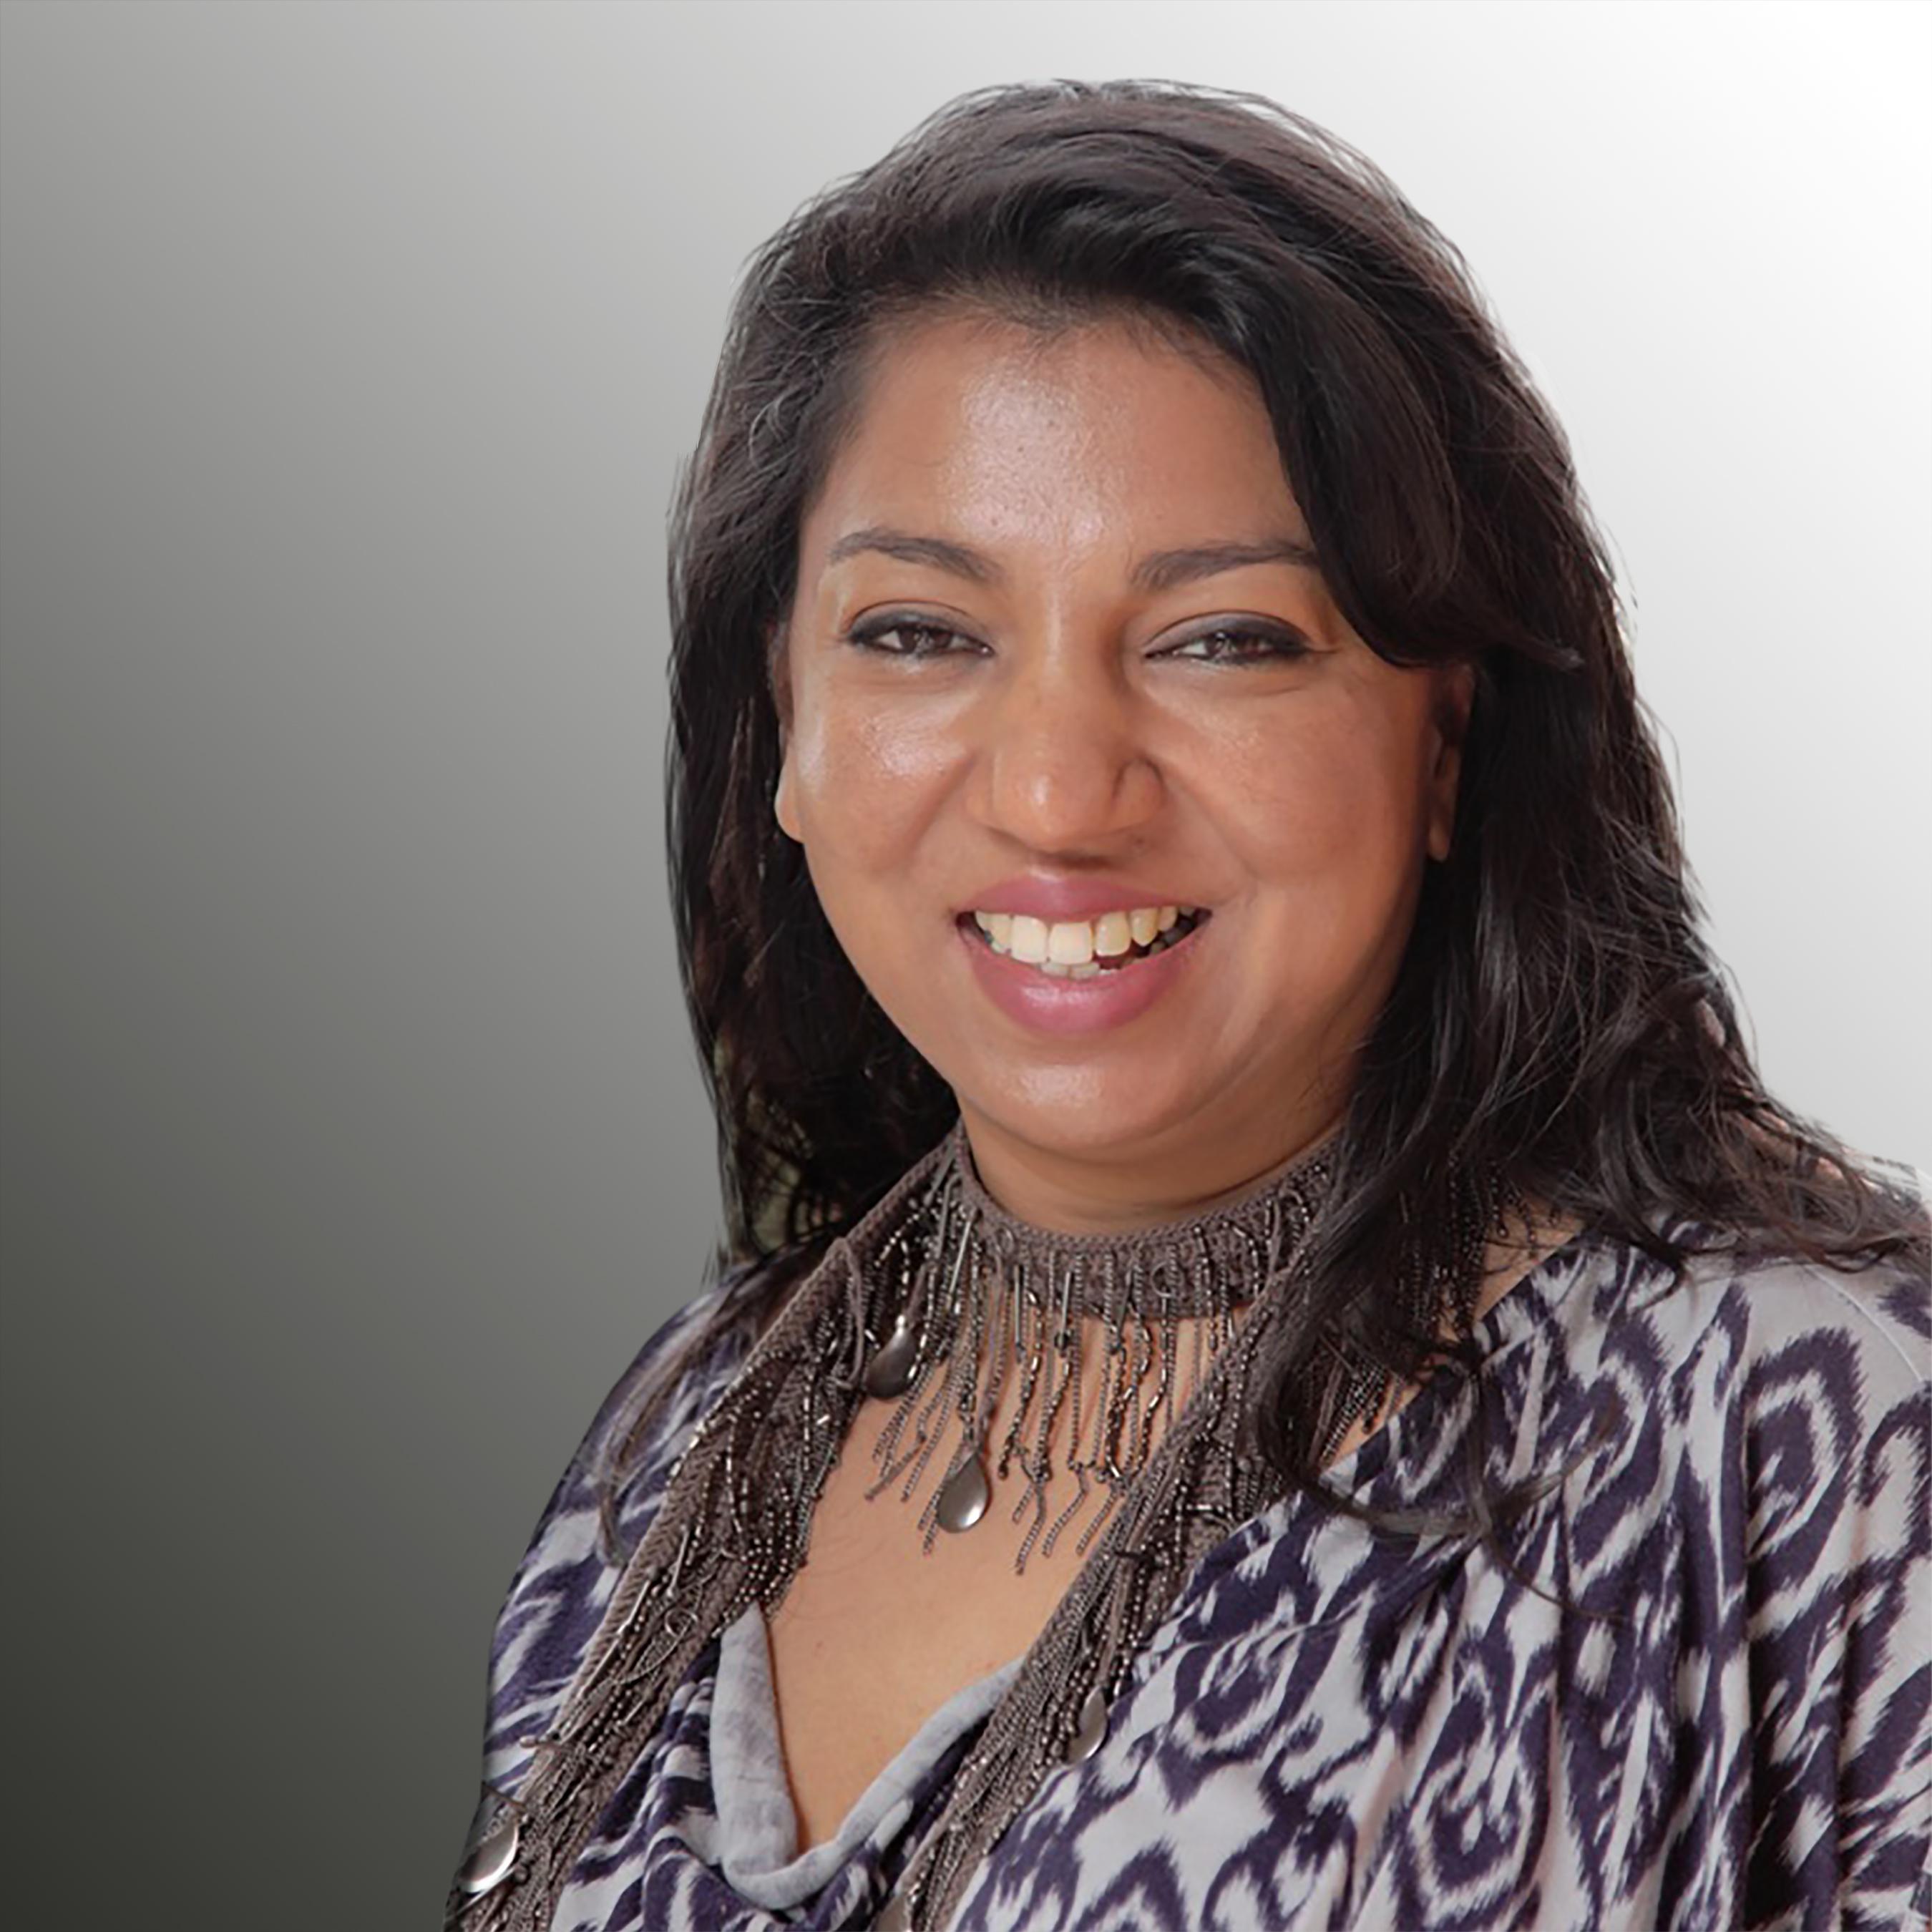 Asyia Sheik-Ojwang